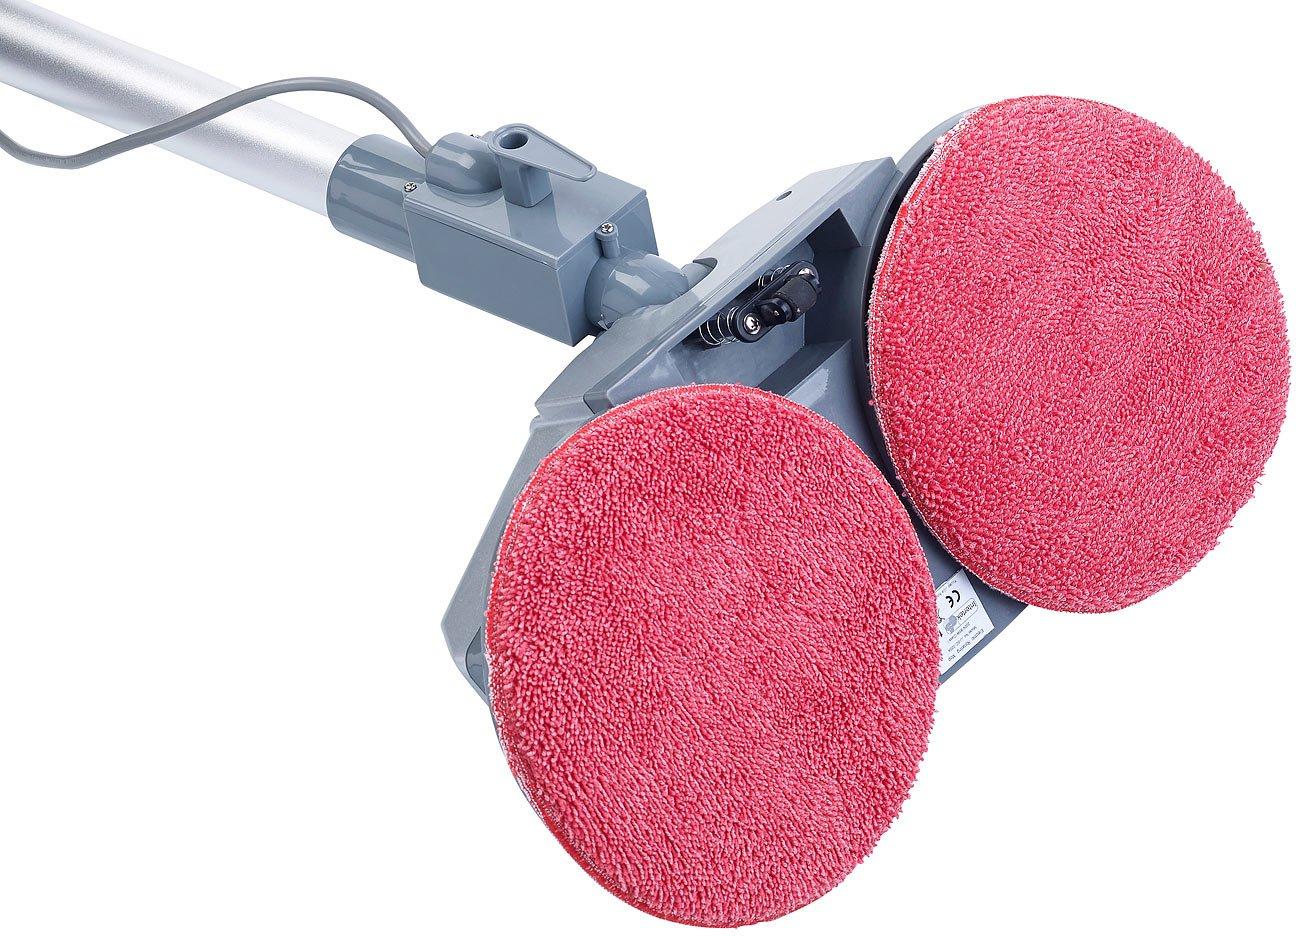 Fußboden Poliermaschine ~ Sichler haushaltsgeräte bodenpoliermaschine: amazon.de: elektronik